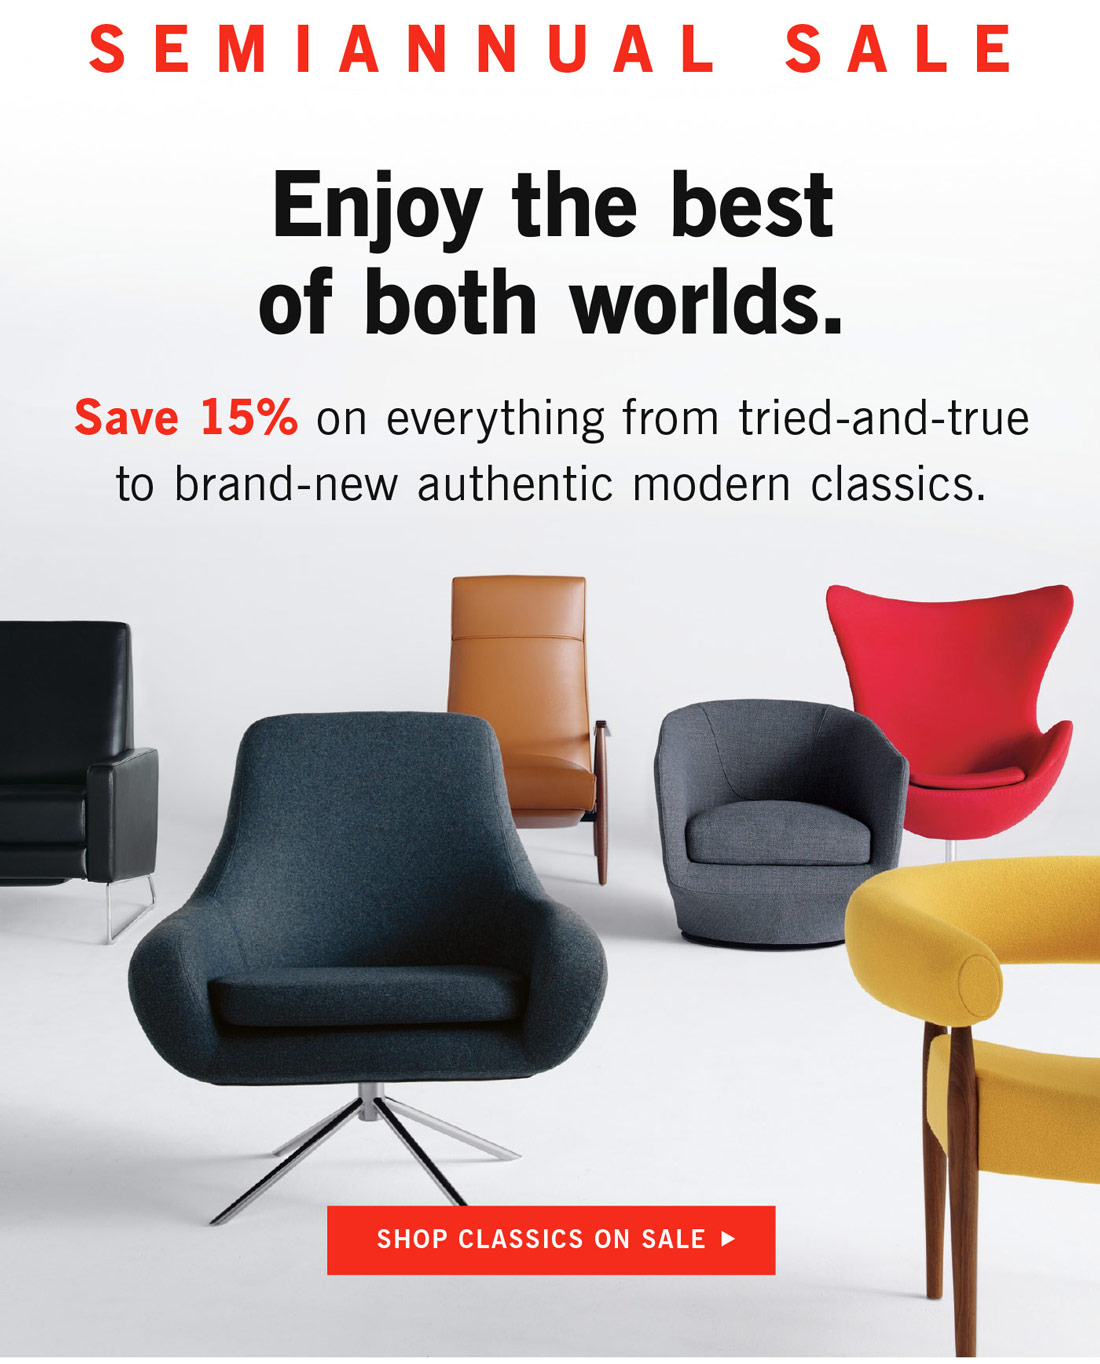 Shop Classics on Sale!